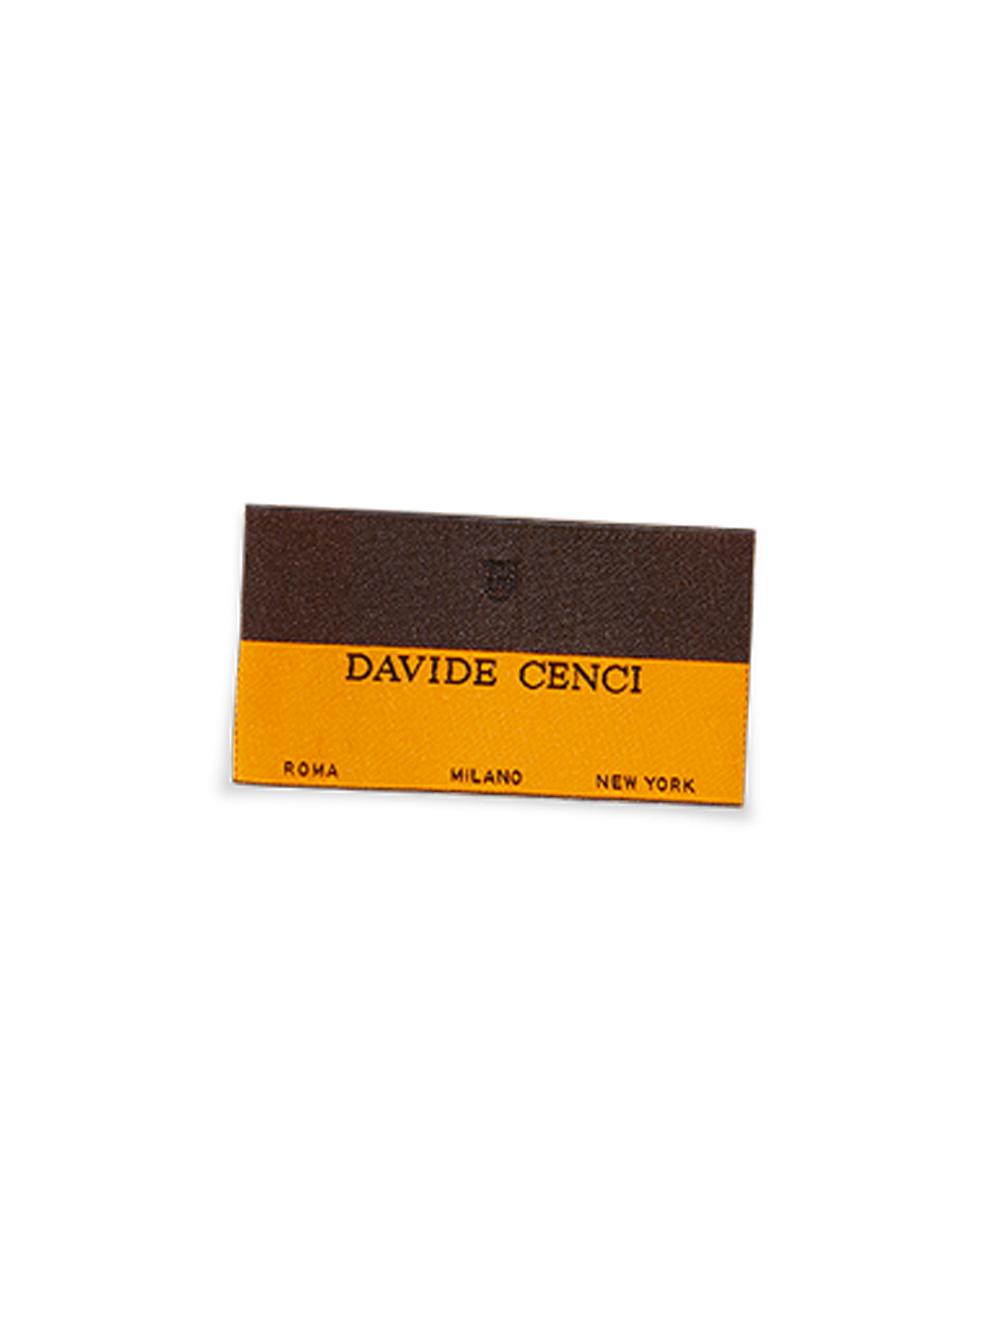 Blue silk jacquard tie Davide Cenci with orange micro polka dots